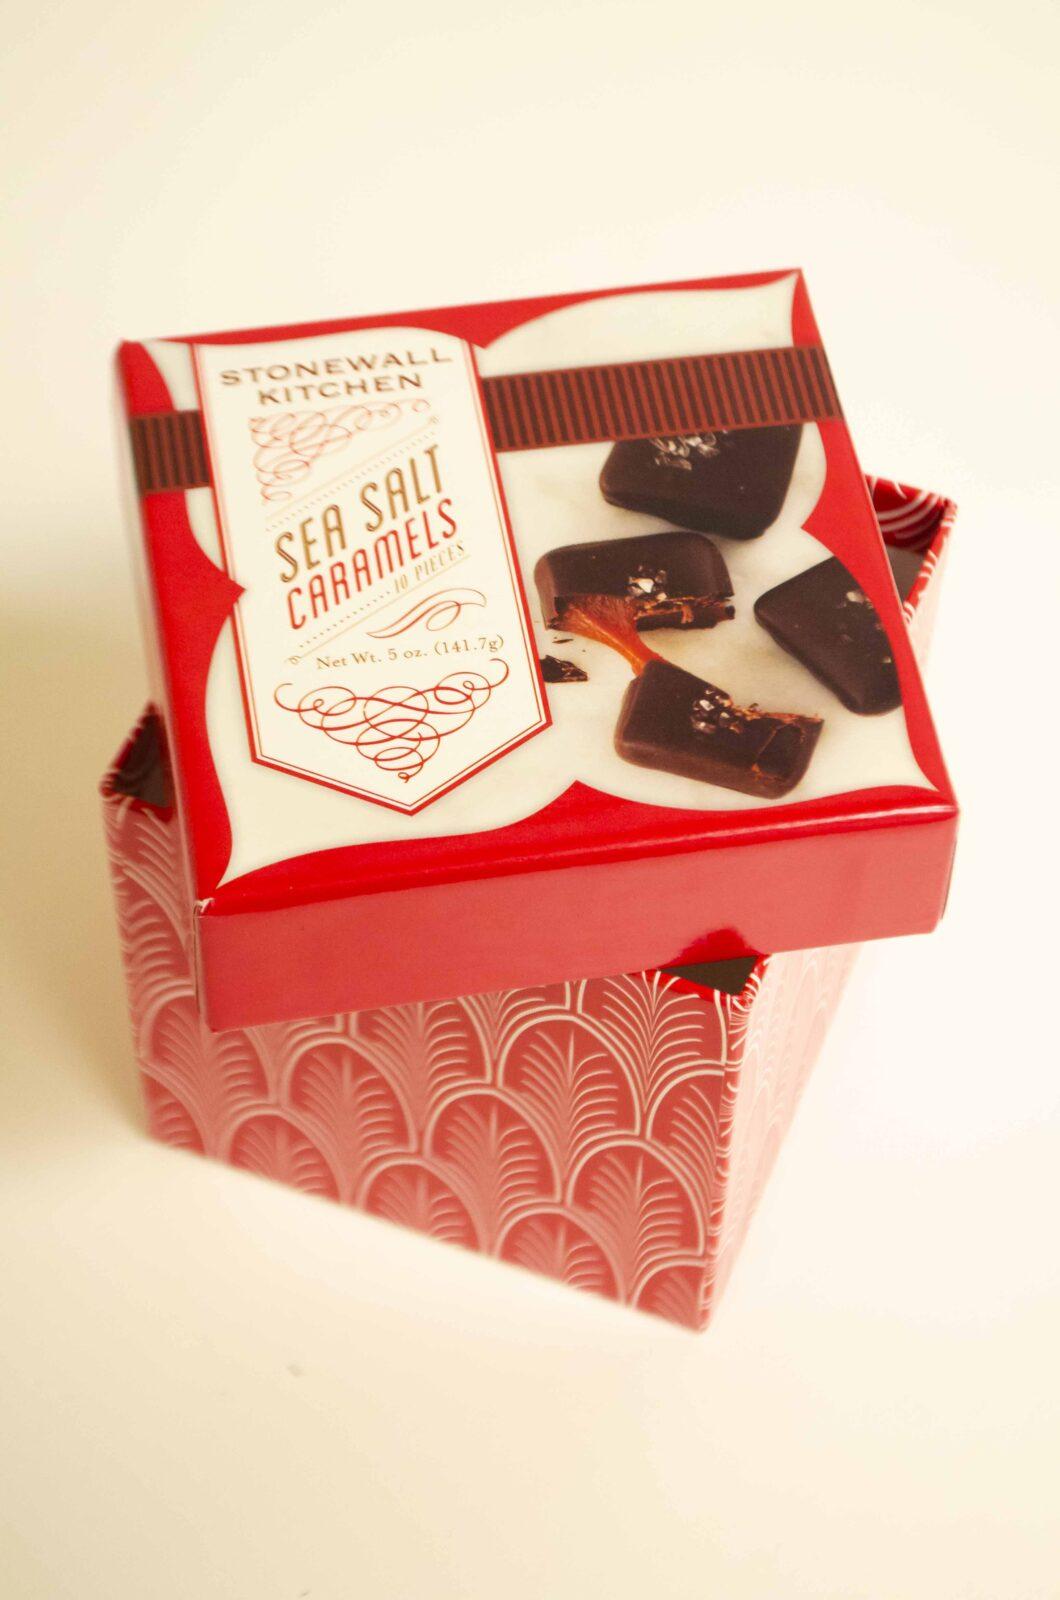 Sea Salt Caramels Candy Boxes